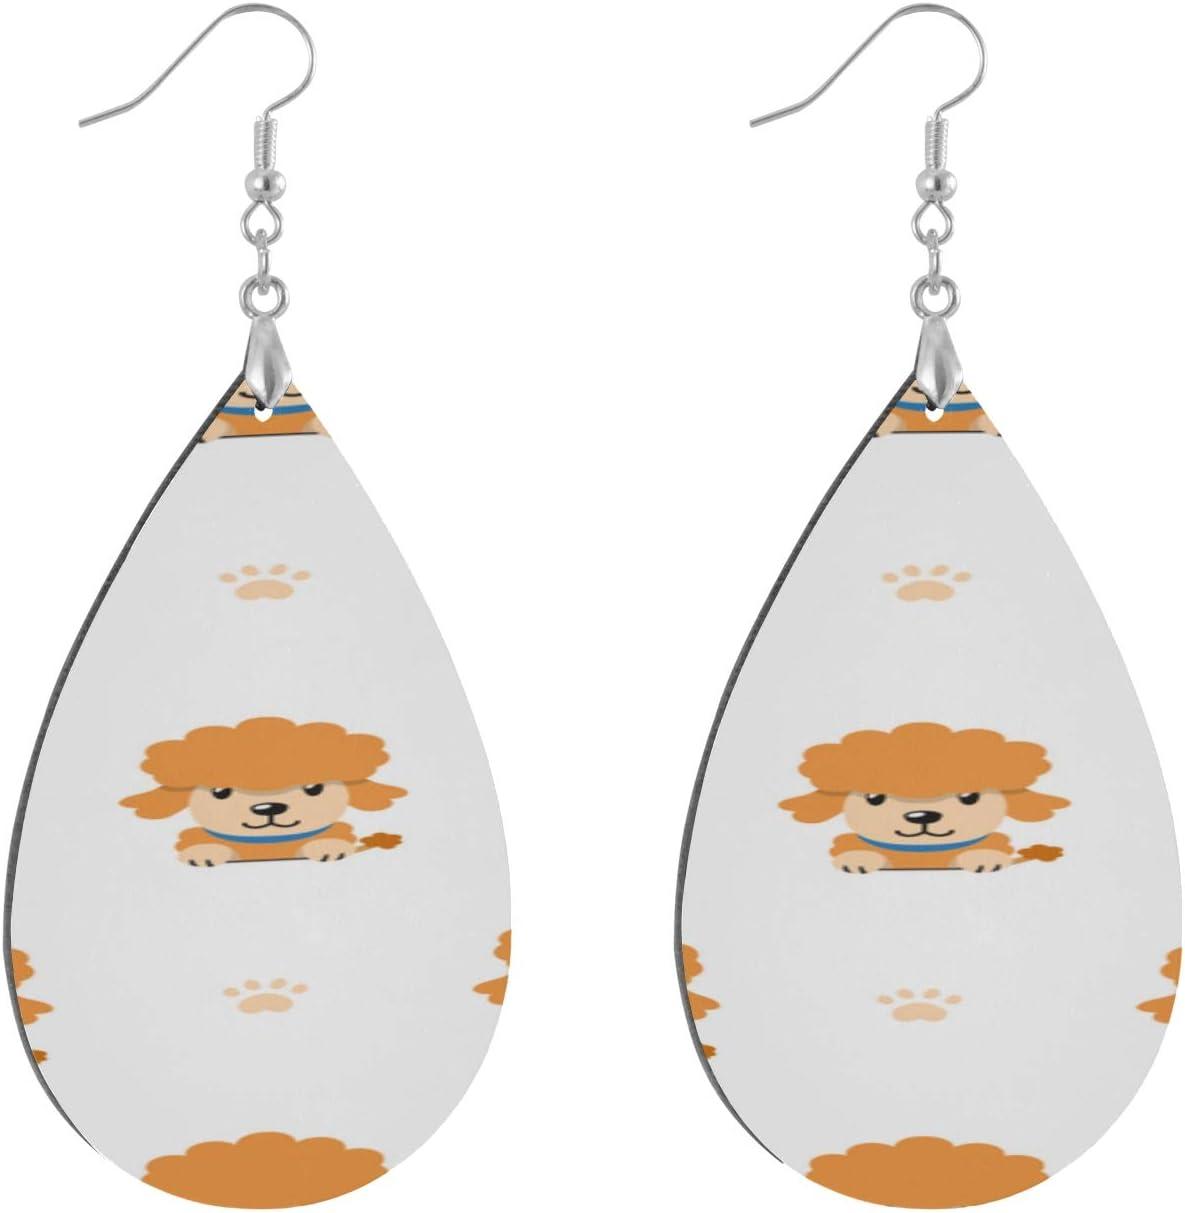 HRRPS Teardrop Earring Round Circle Earring Dangle Earings Lightweight Cartoon Character Poodle Dog Wooden Earrings Drop Dangle Earings Lightweight Beautiful and for Women Girls